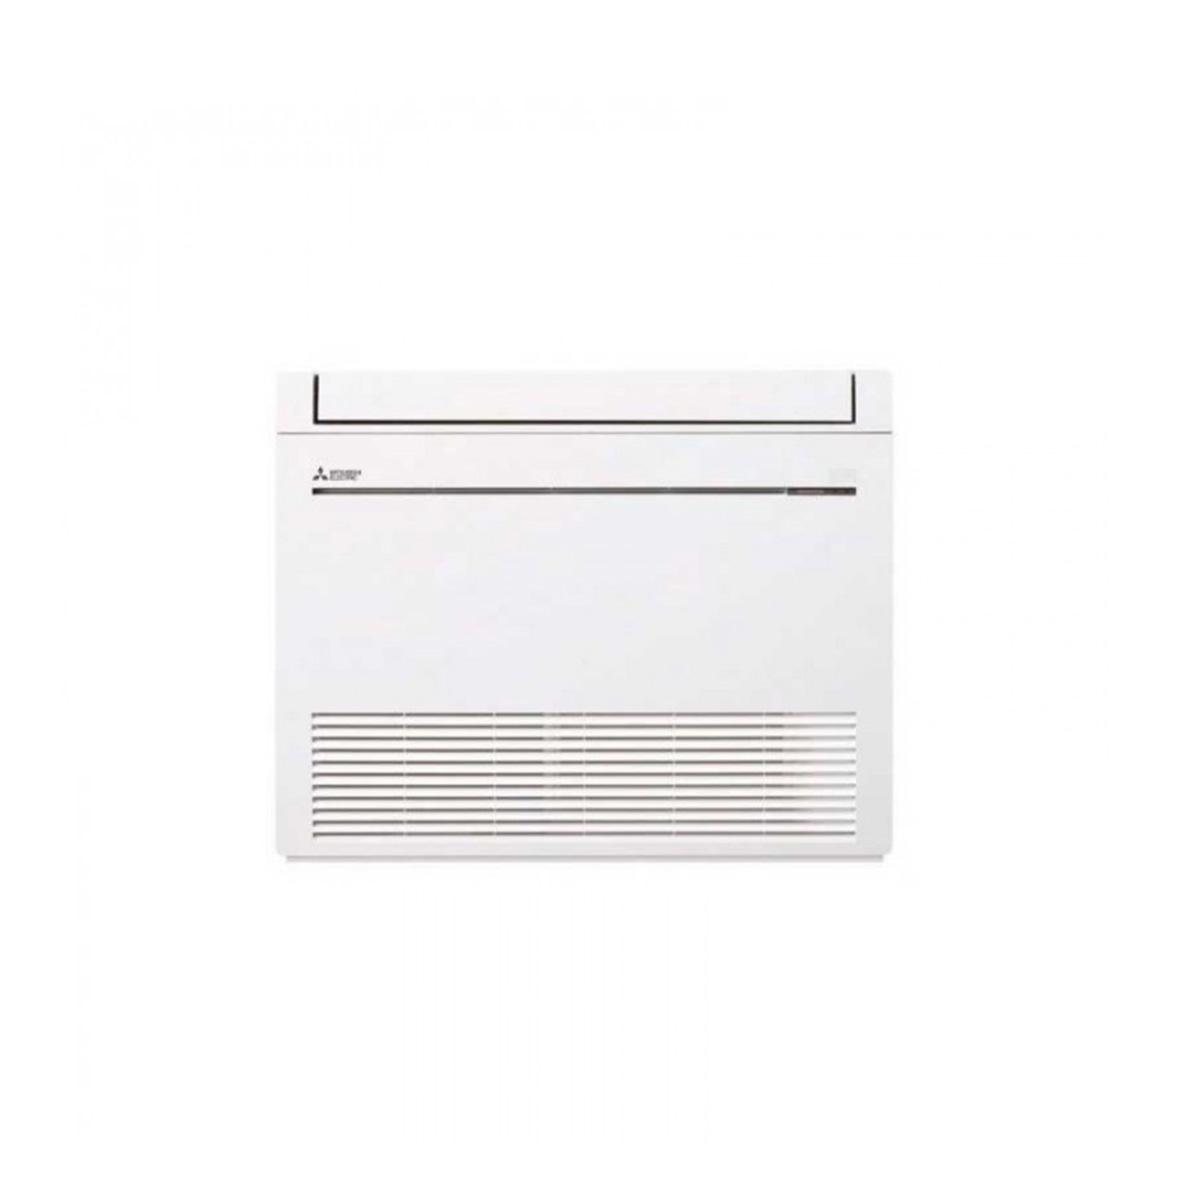 Aparat de aer conditionat tip consola Mitsubishi Electric MFZ-KT + SUZ-M Inverter, A++, R32, WIFI READY 14